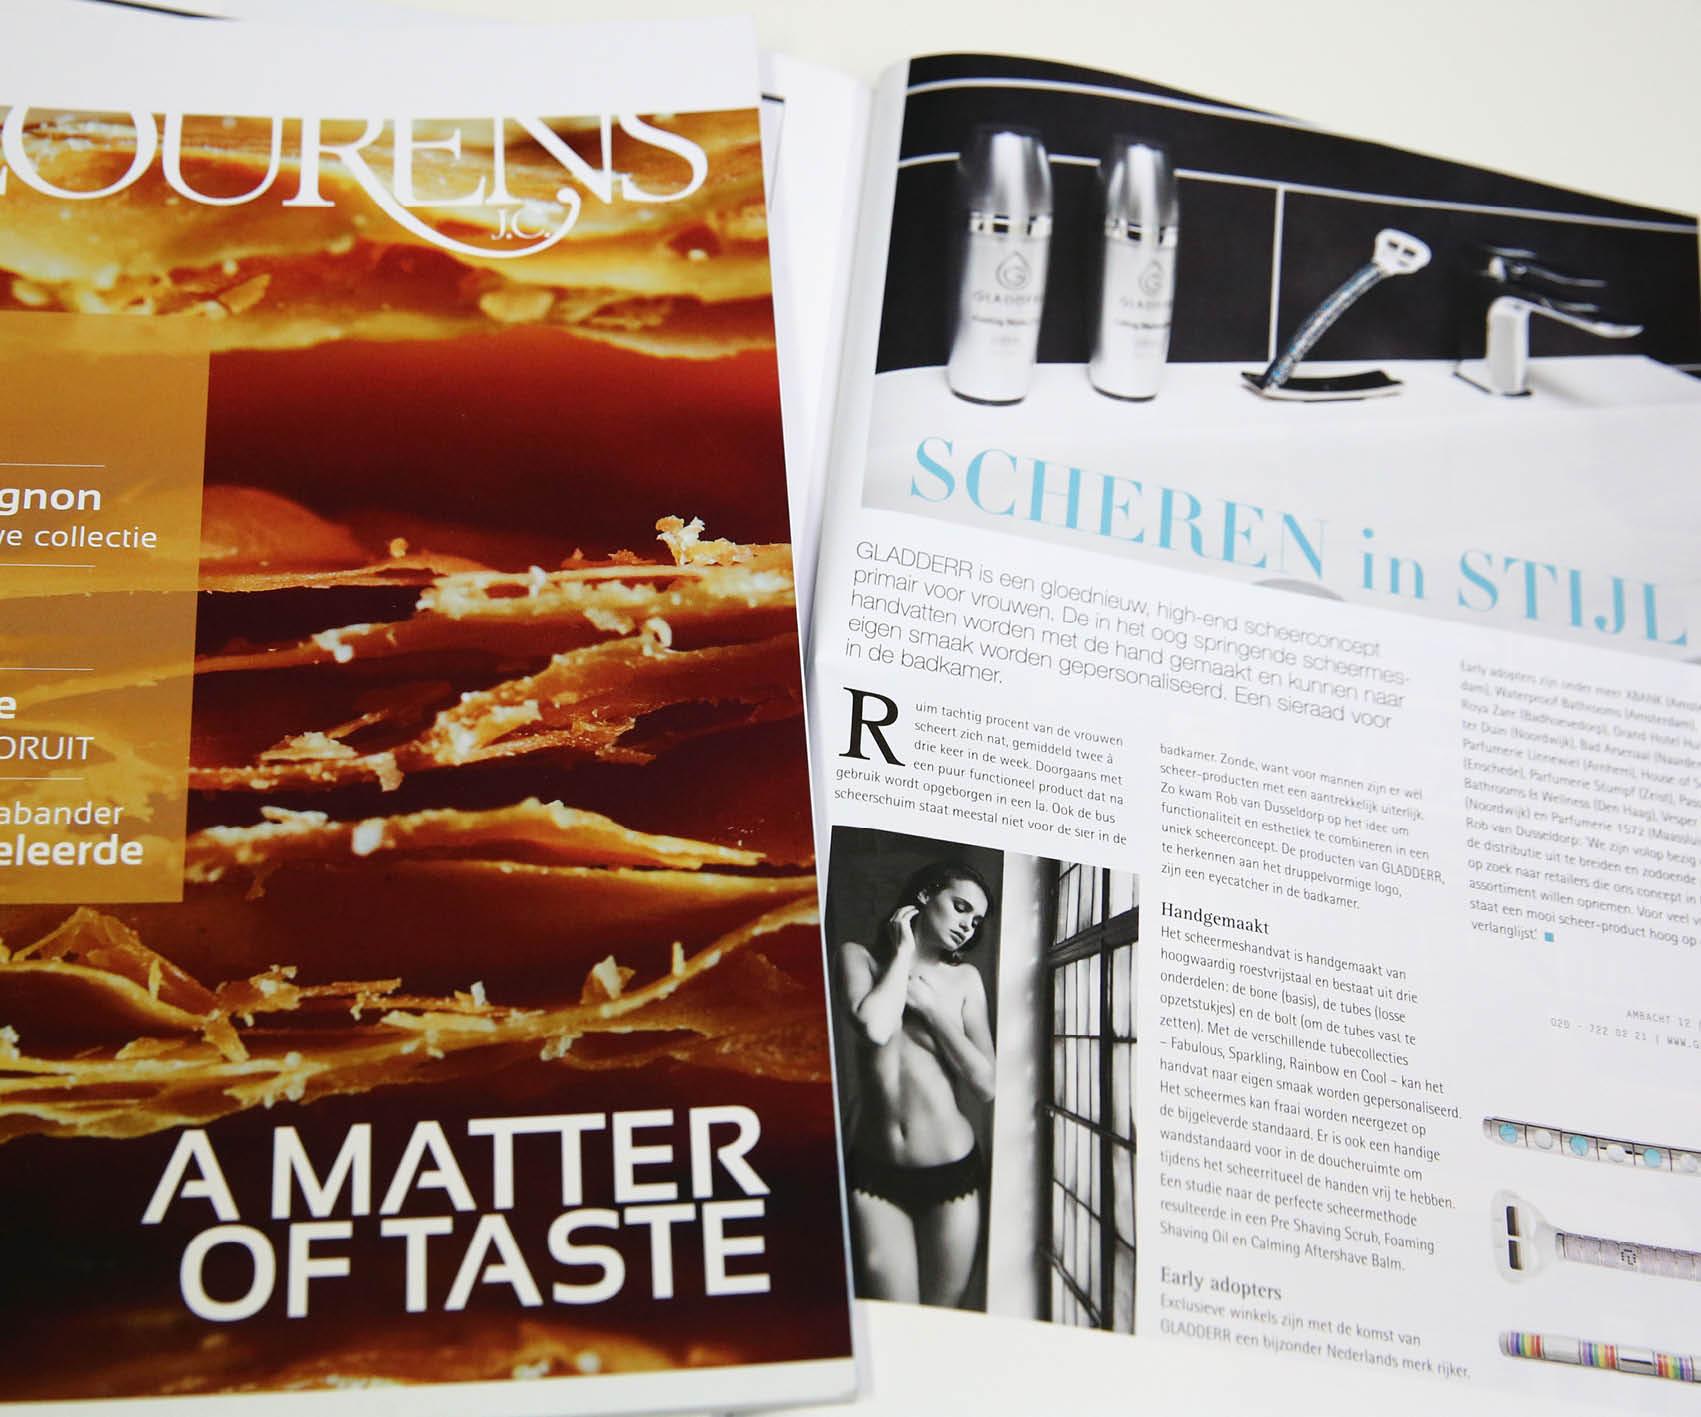 Lourens Magazine: Scheren in stijl